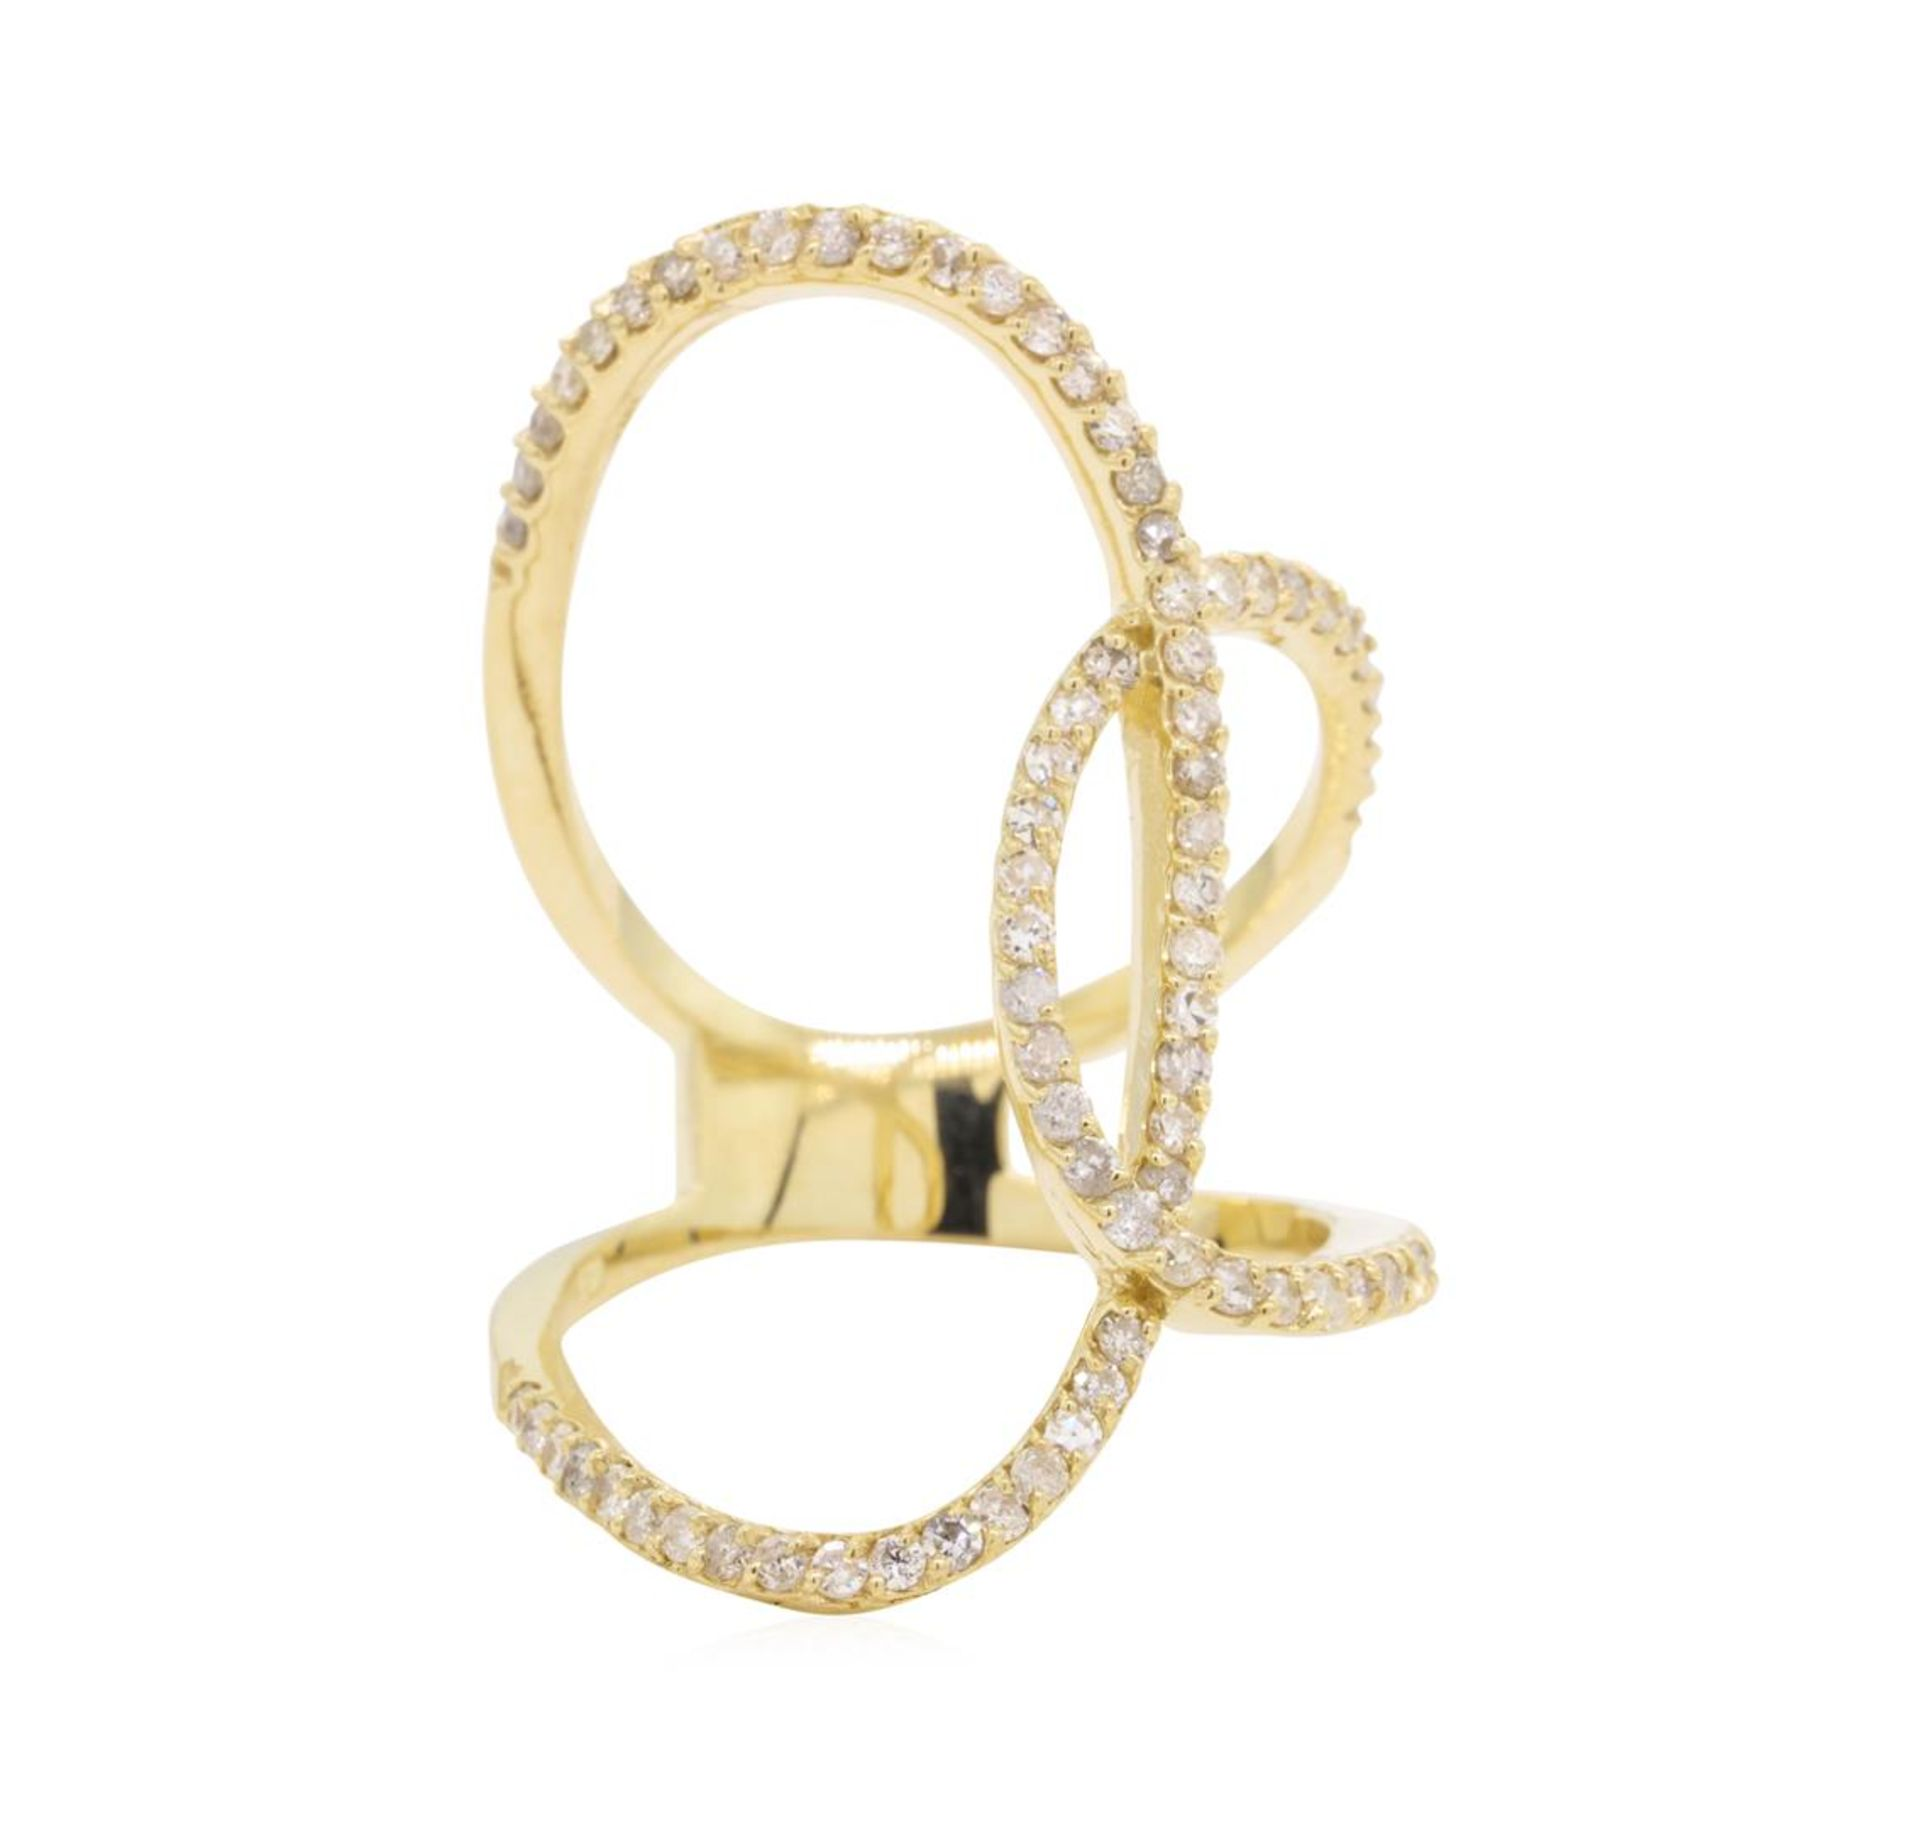 0.75 ctw Diamond Ring - 14KT Yellow Gold - Image 4 of 5